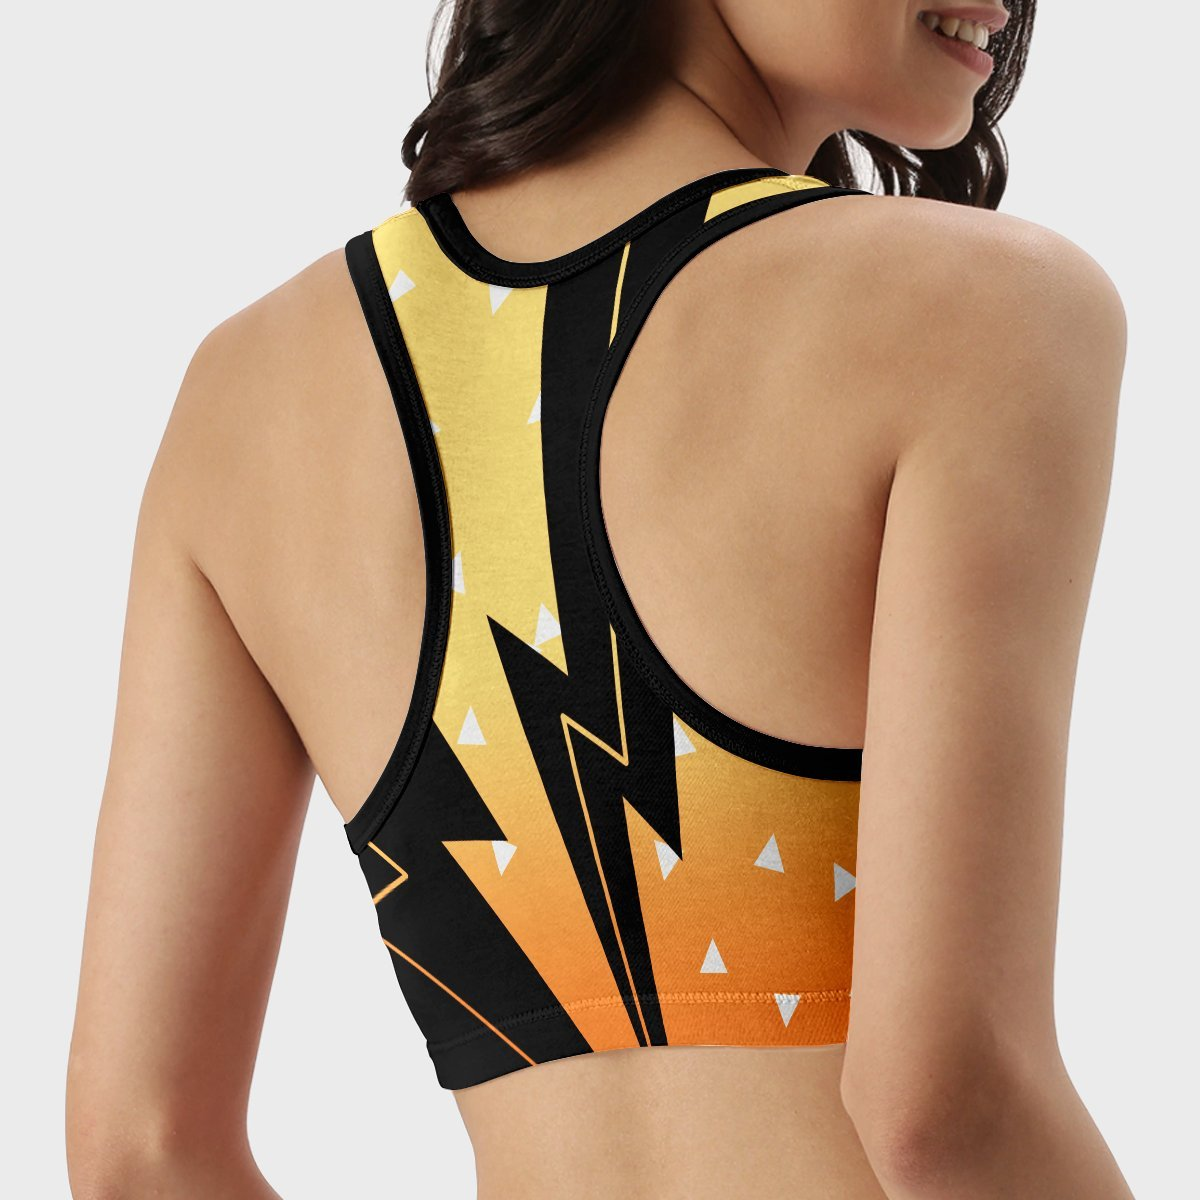 summer zenitsu active wear set 681006 - Anime Swimsuits